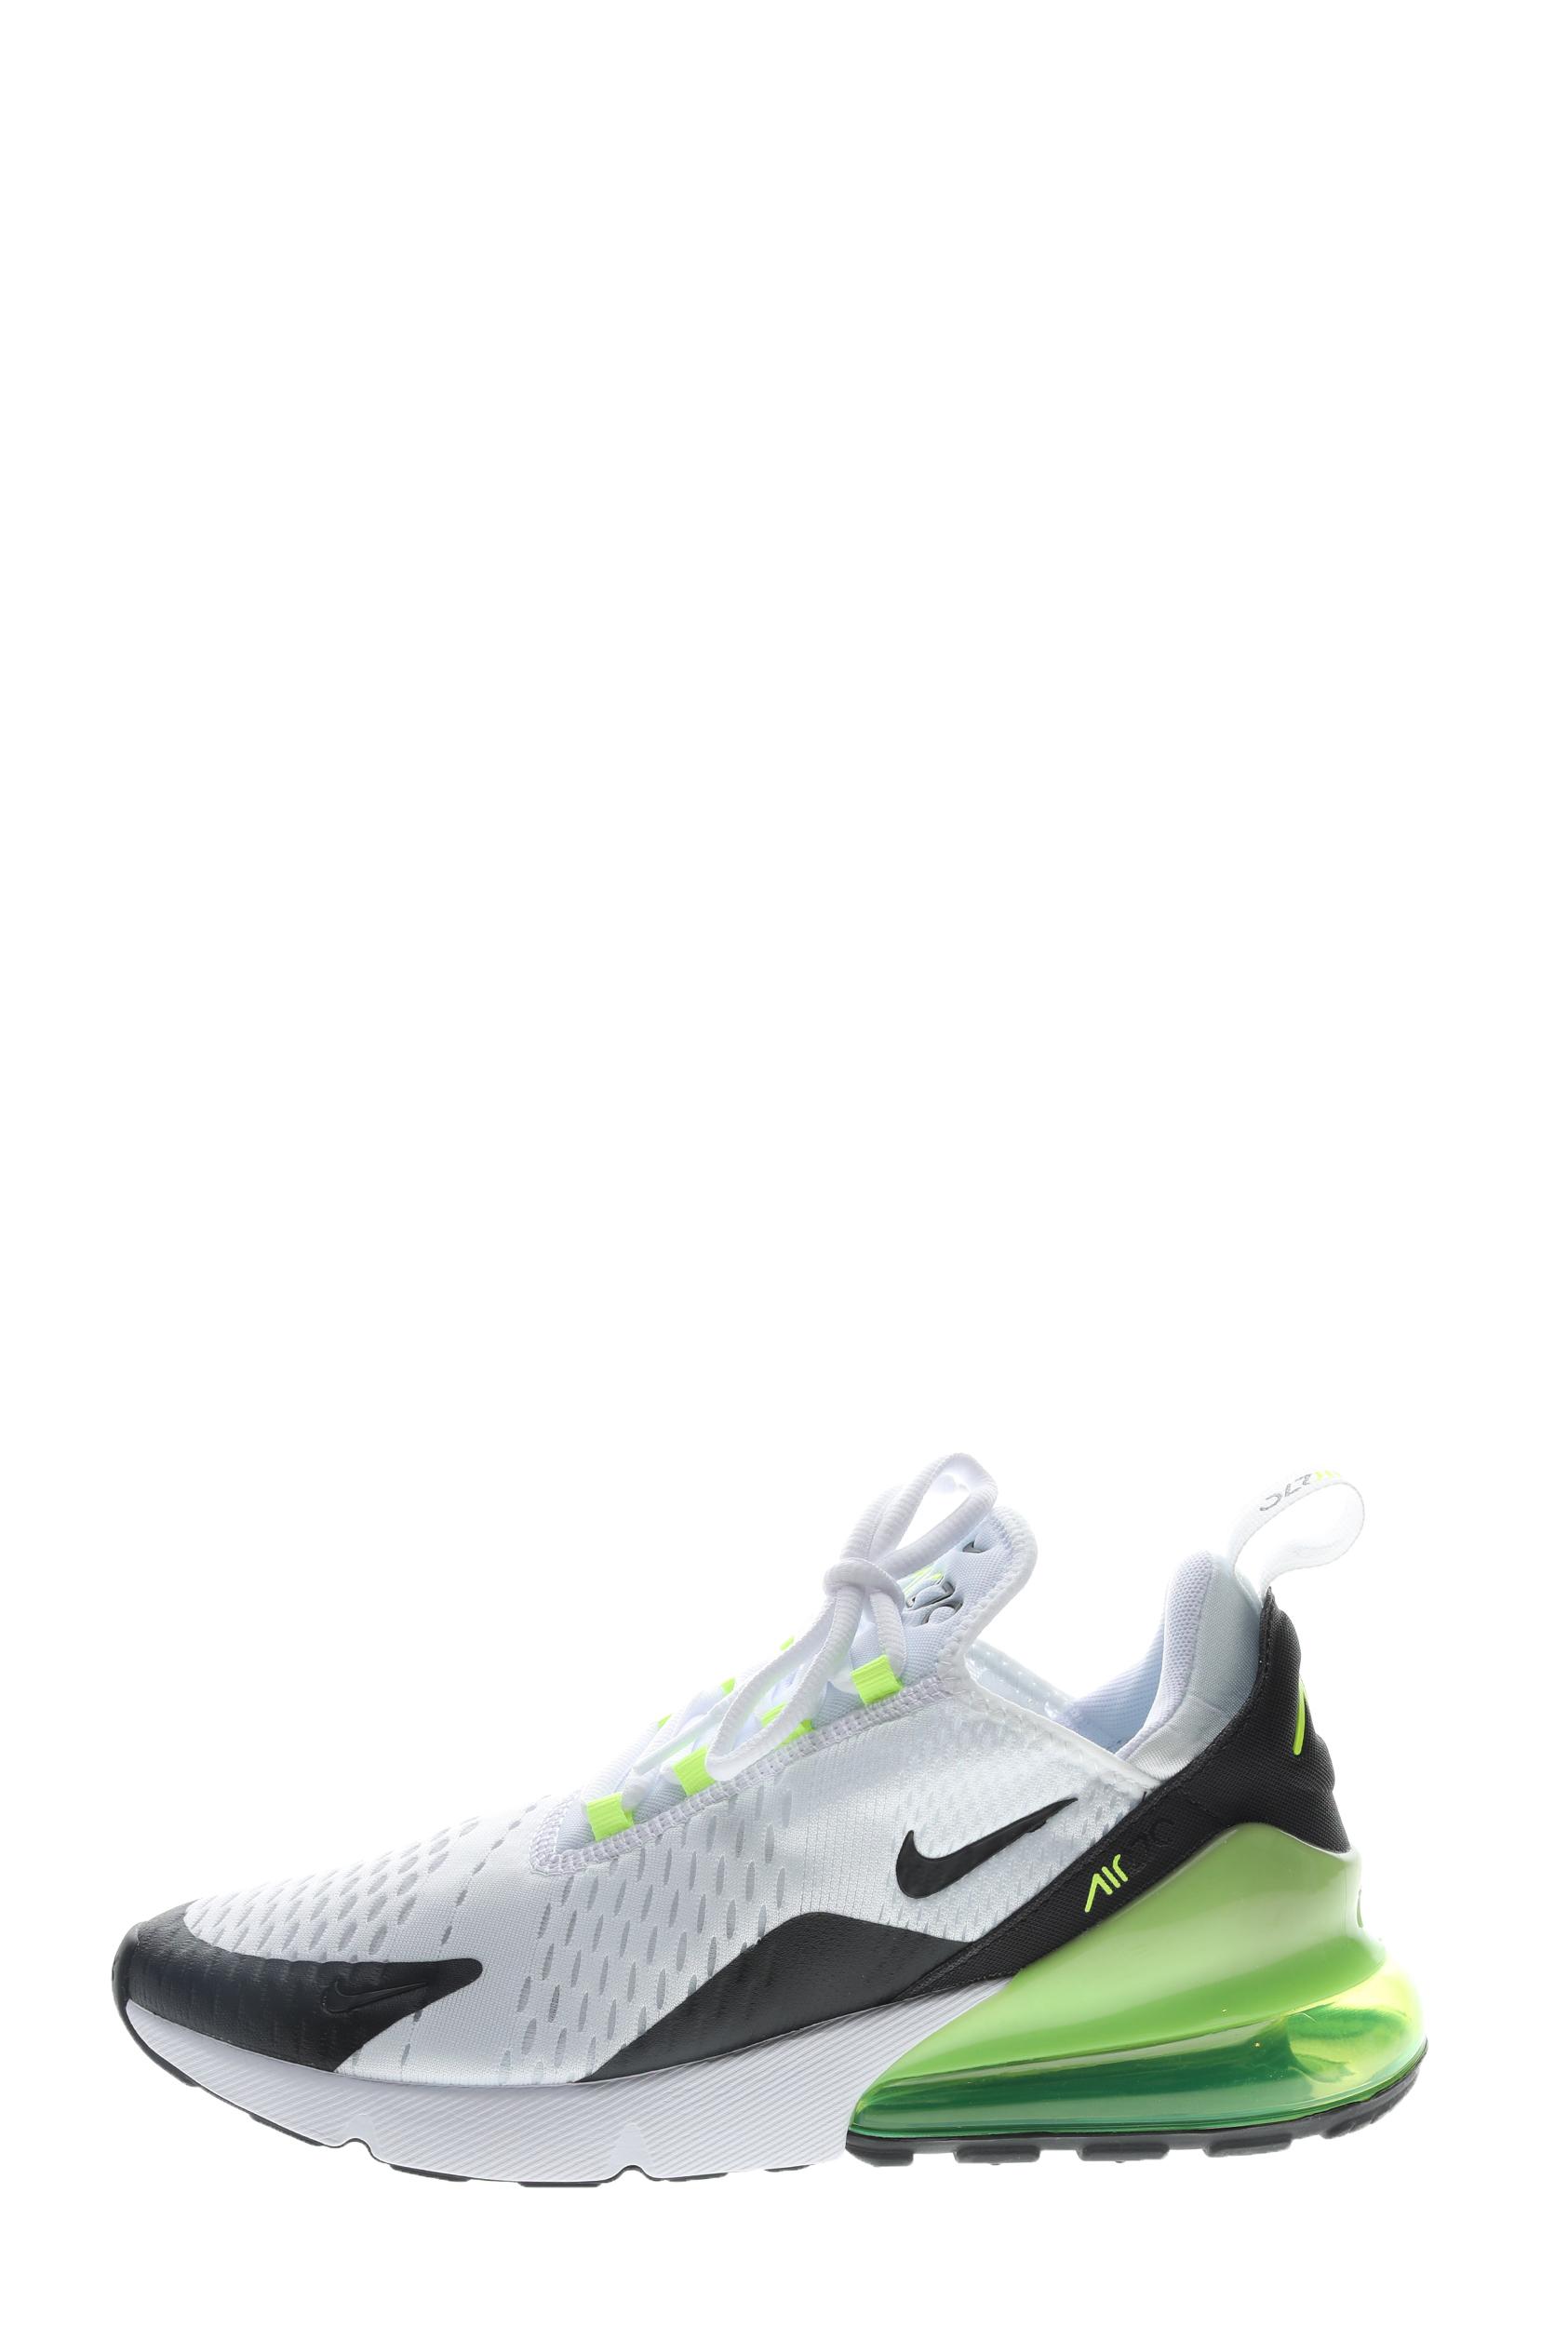 NIKE – Ανδρικά παπούτσια running NIKE AIR MAX 270 λευκό